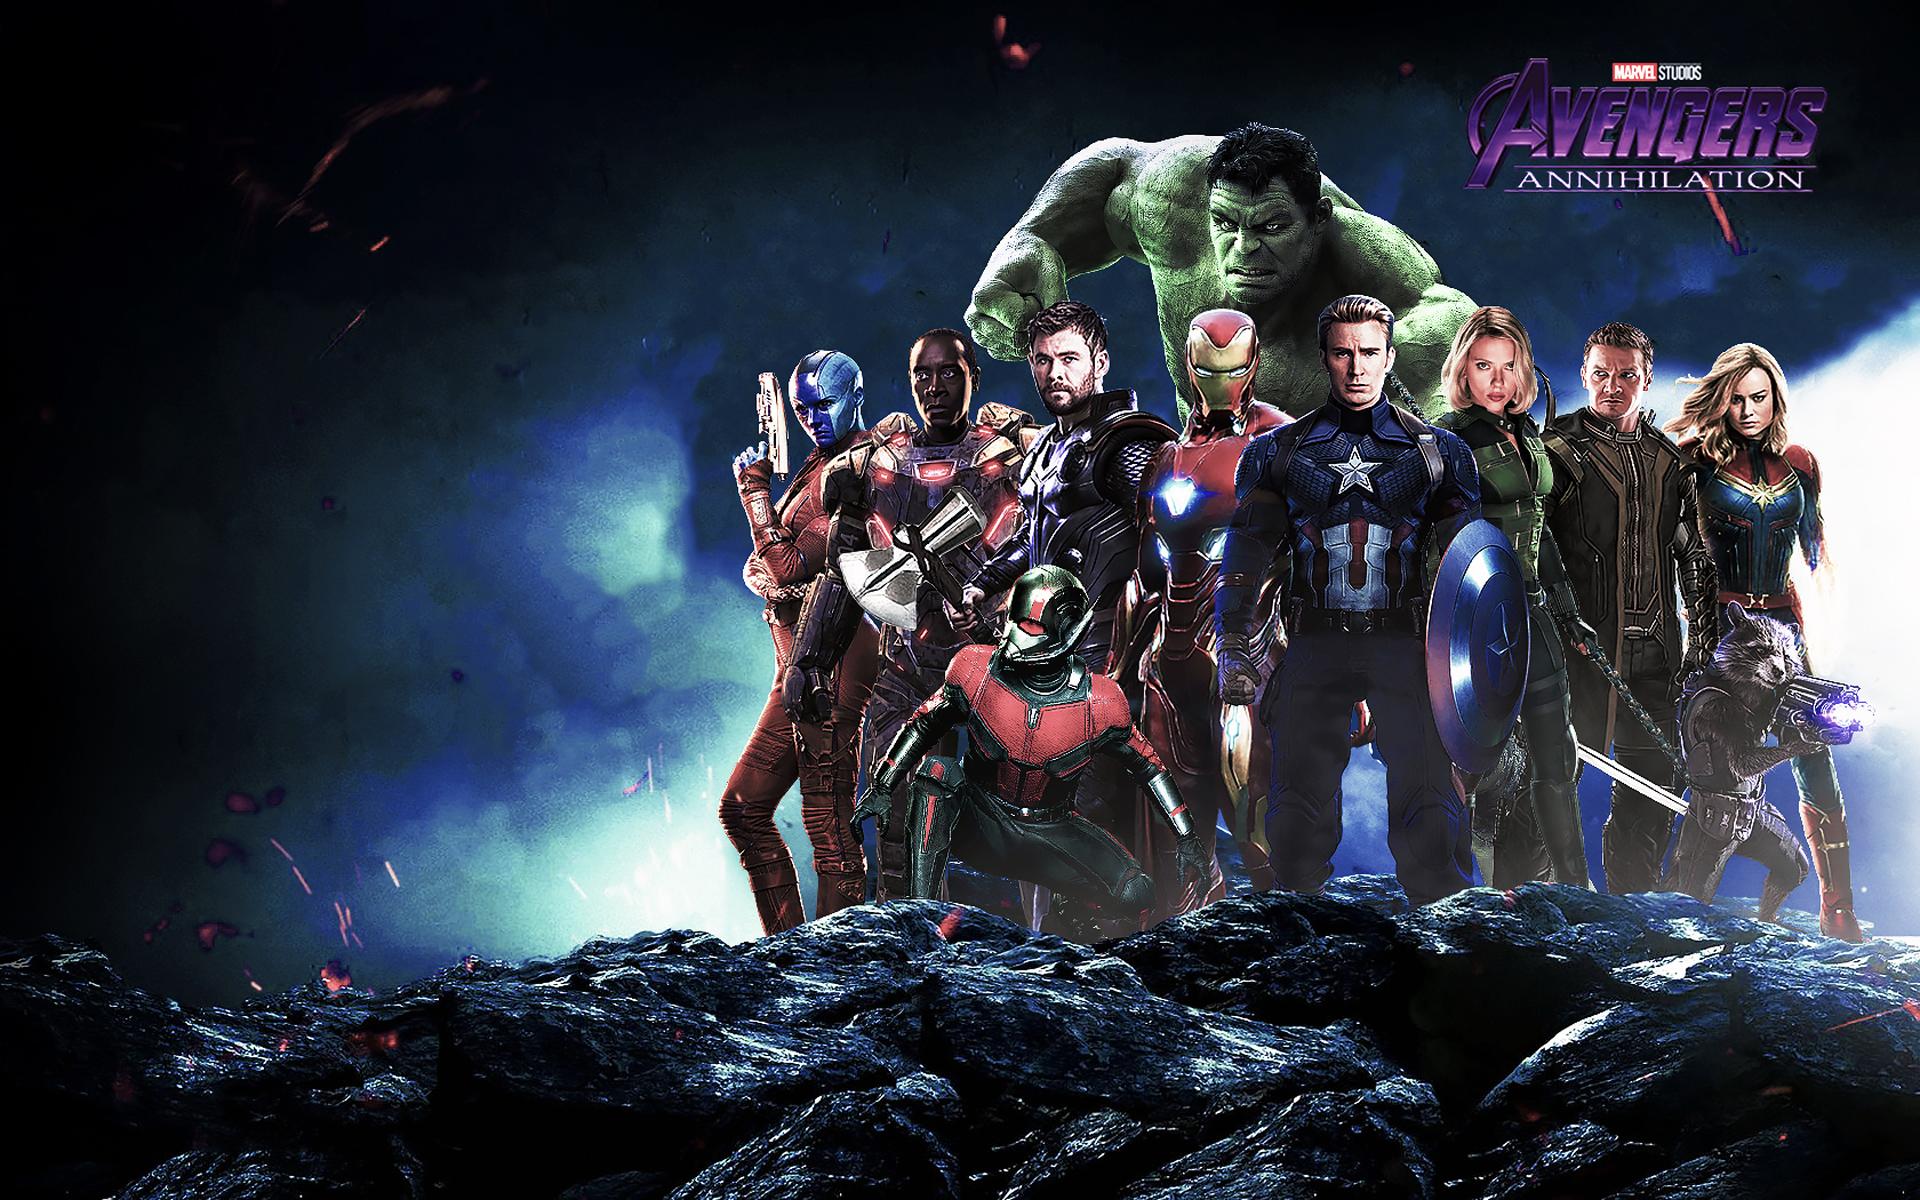 Wallpaper 4k Avengers Annihilation 2019 Movies Wallpapers Avengers